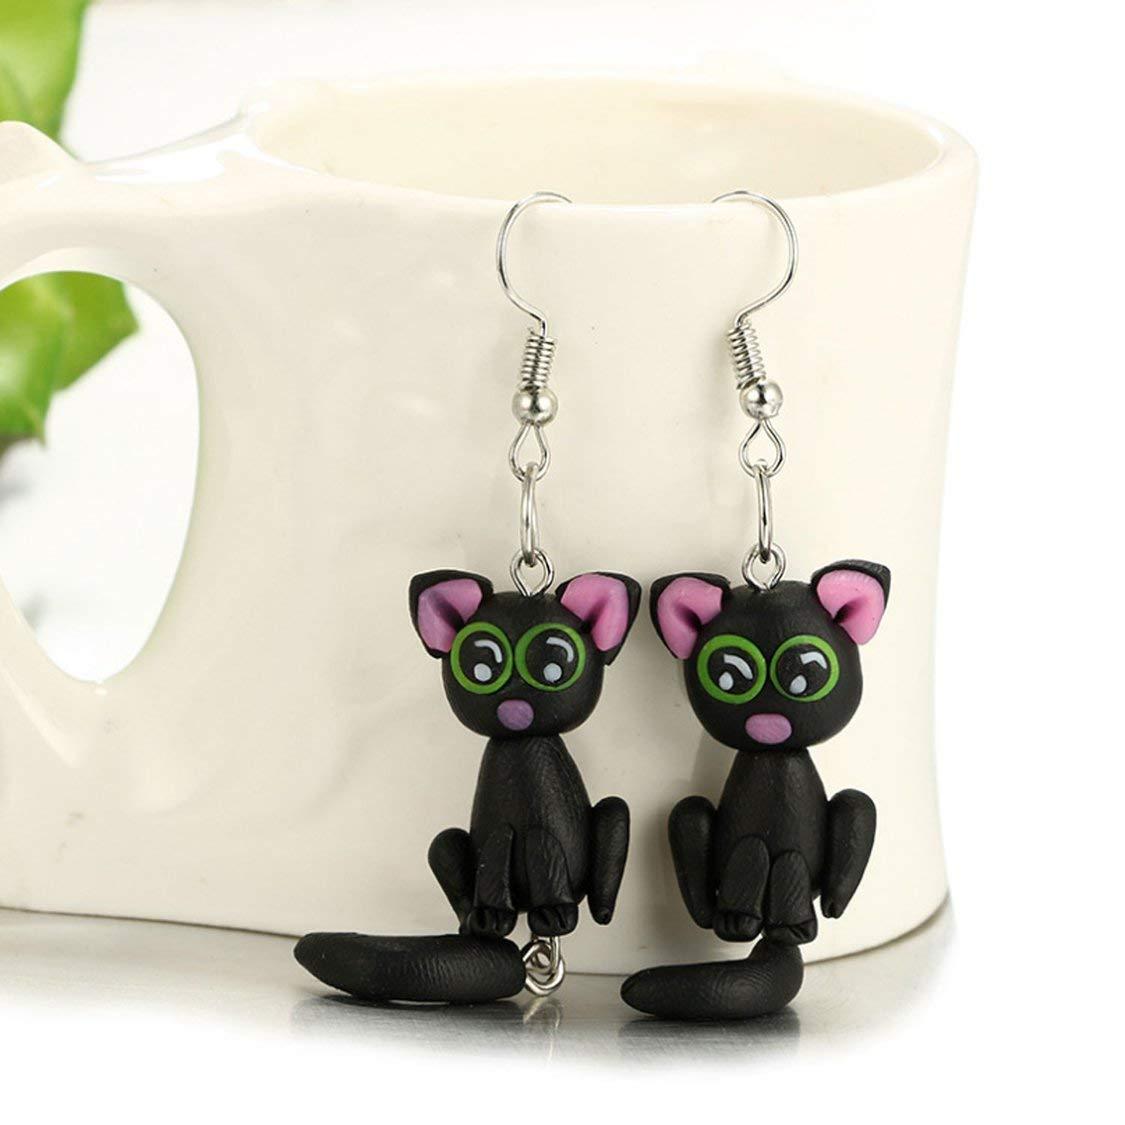 Black Big Eye Black cat Manual Three-Dimensional Polymer Clay Earrings Handmade Polymer Clay YellowEarrings